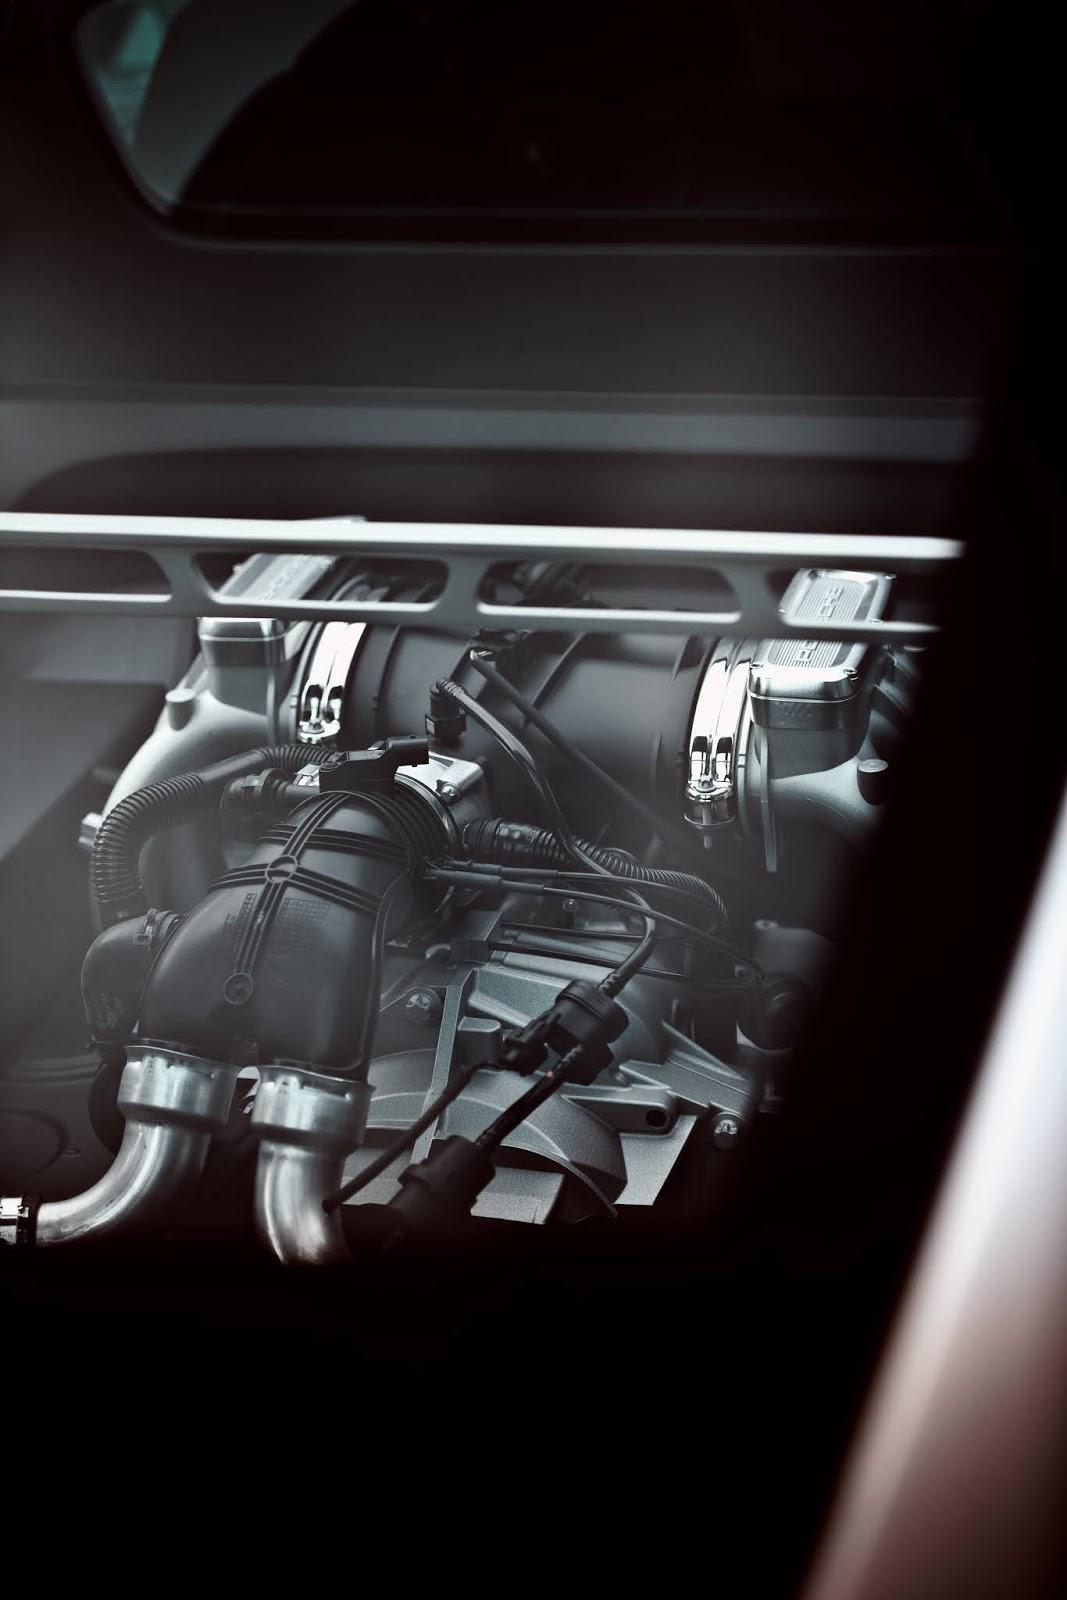 CVS0567 Le Mans Living Legend : Το πρωτότυπο που γέννησε την 718 Cayman GT4 LE MANS, Porsche, Porsche Le Mans, Porsche Unseen, sportscar, supercar, supercars, zblog, ειδήσεις